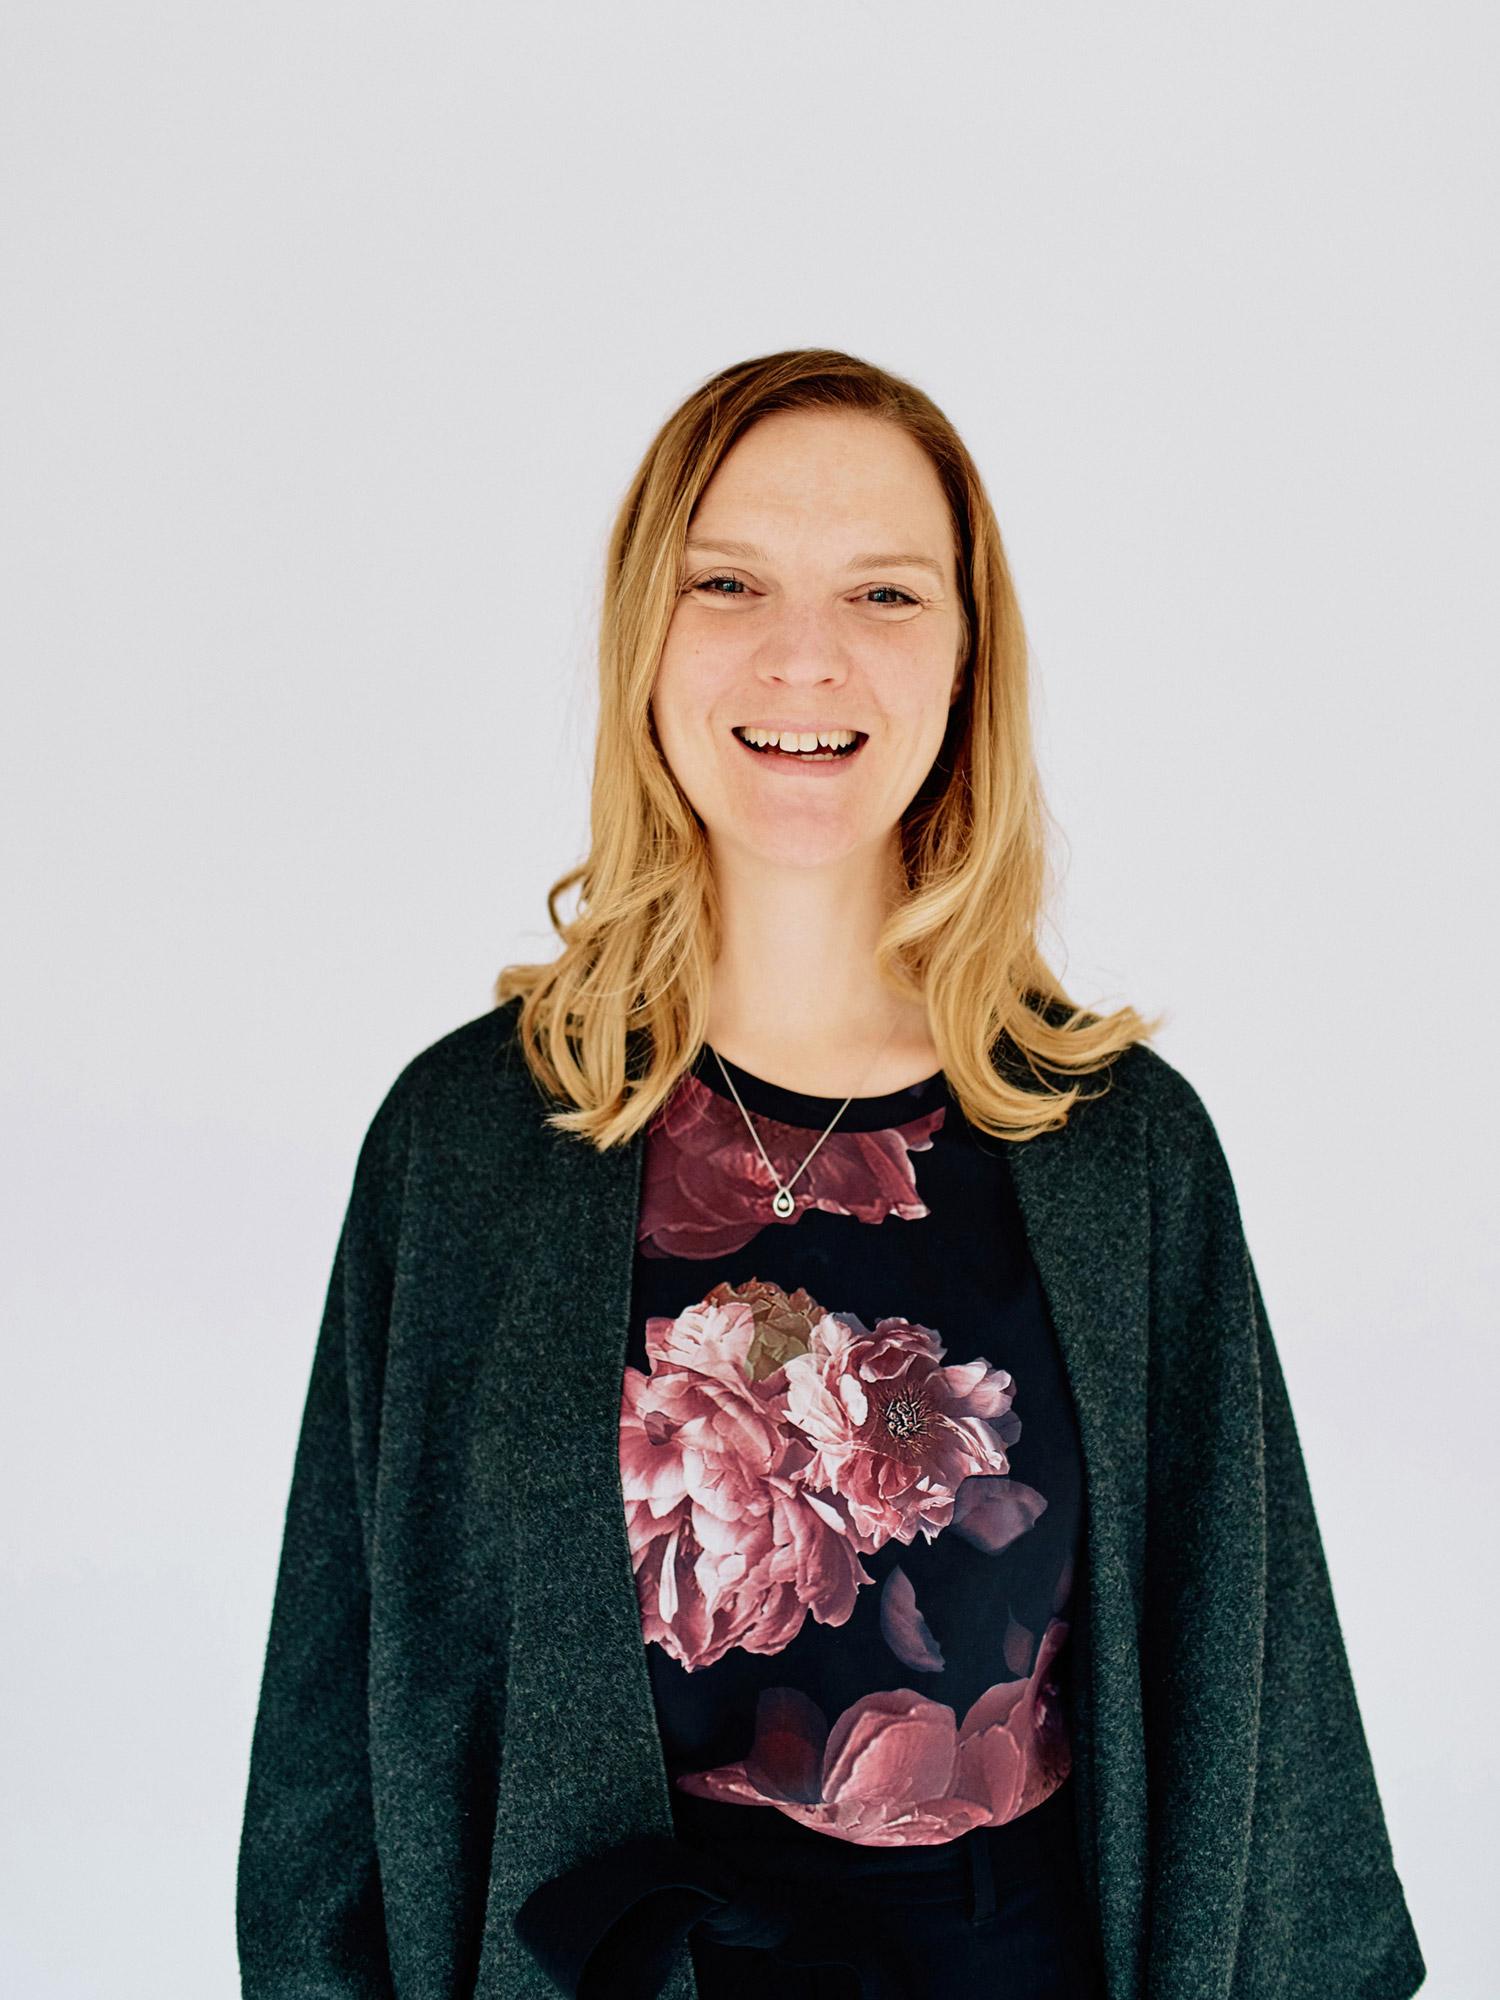 Lisa Van Koll